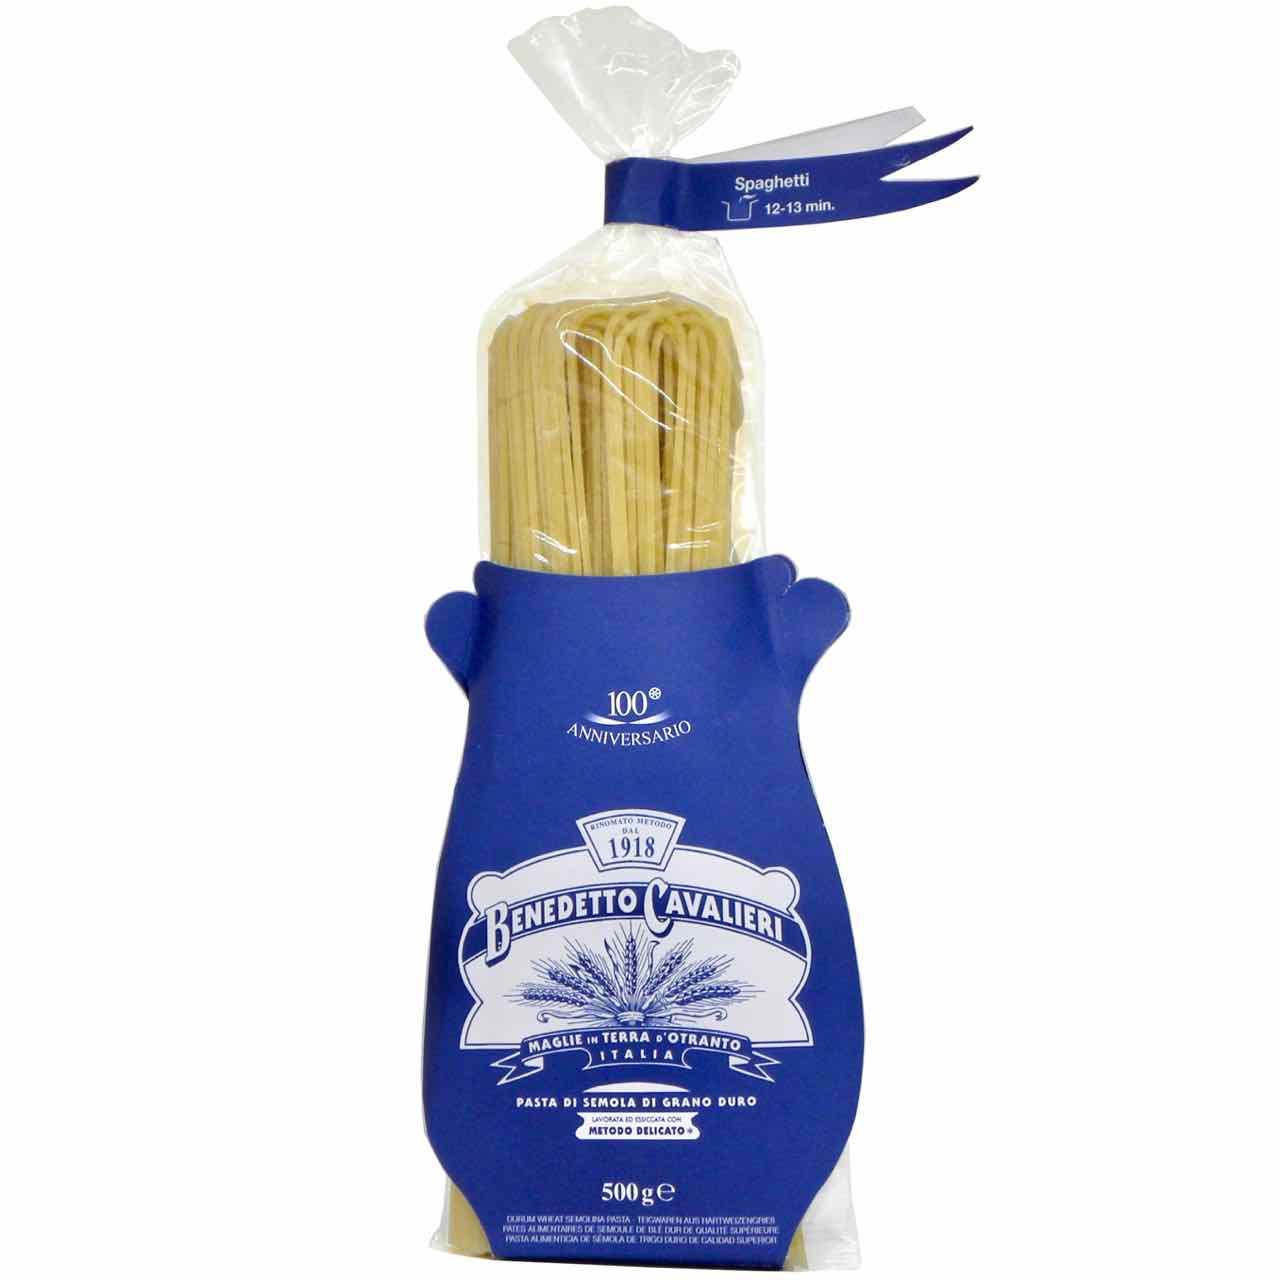 spaghetti Cavalieri – best Italian food – Gustorotondo online food shop – authentic Italian artisan food online